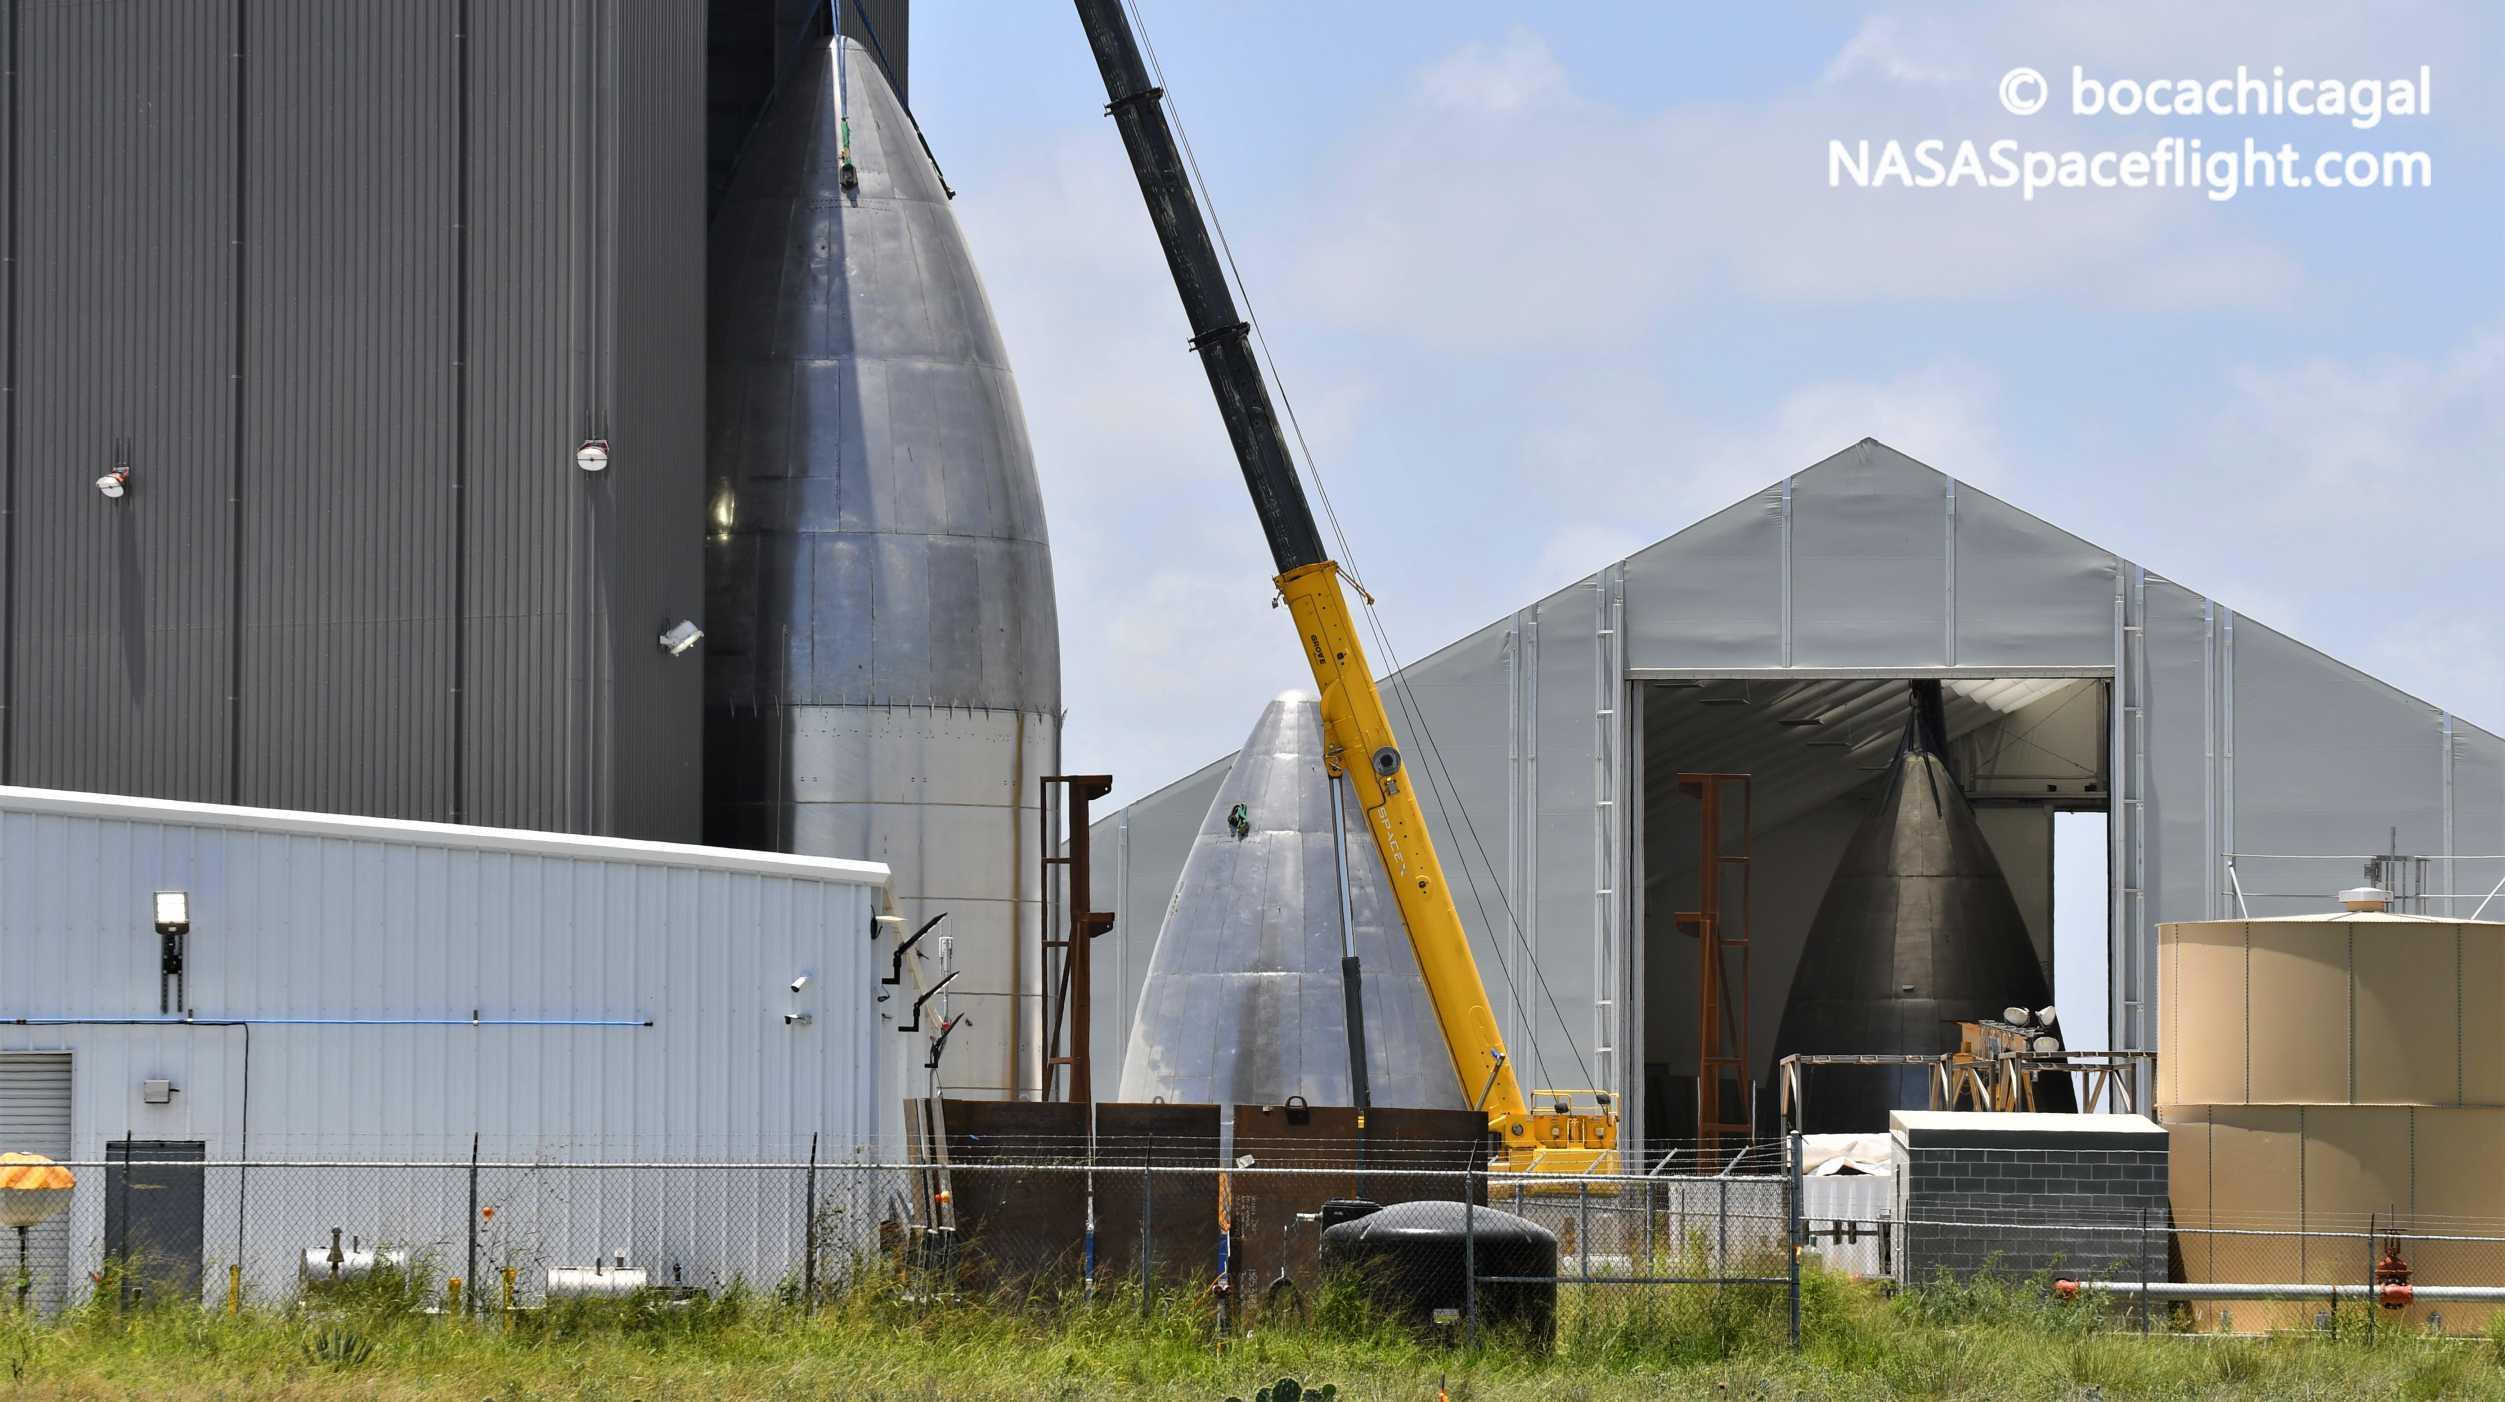 Starship Boca Chica 071420 (NASASpaceflight – bocachicagal) nose stack 10 crop (c)